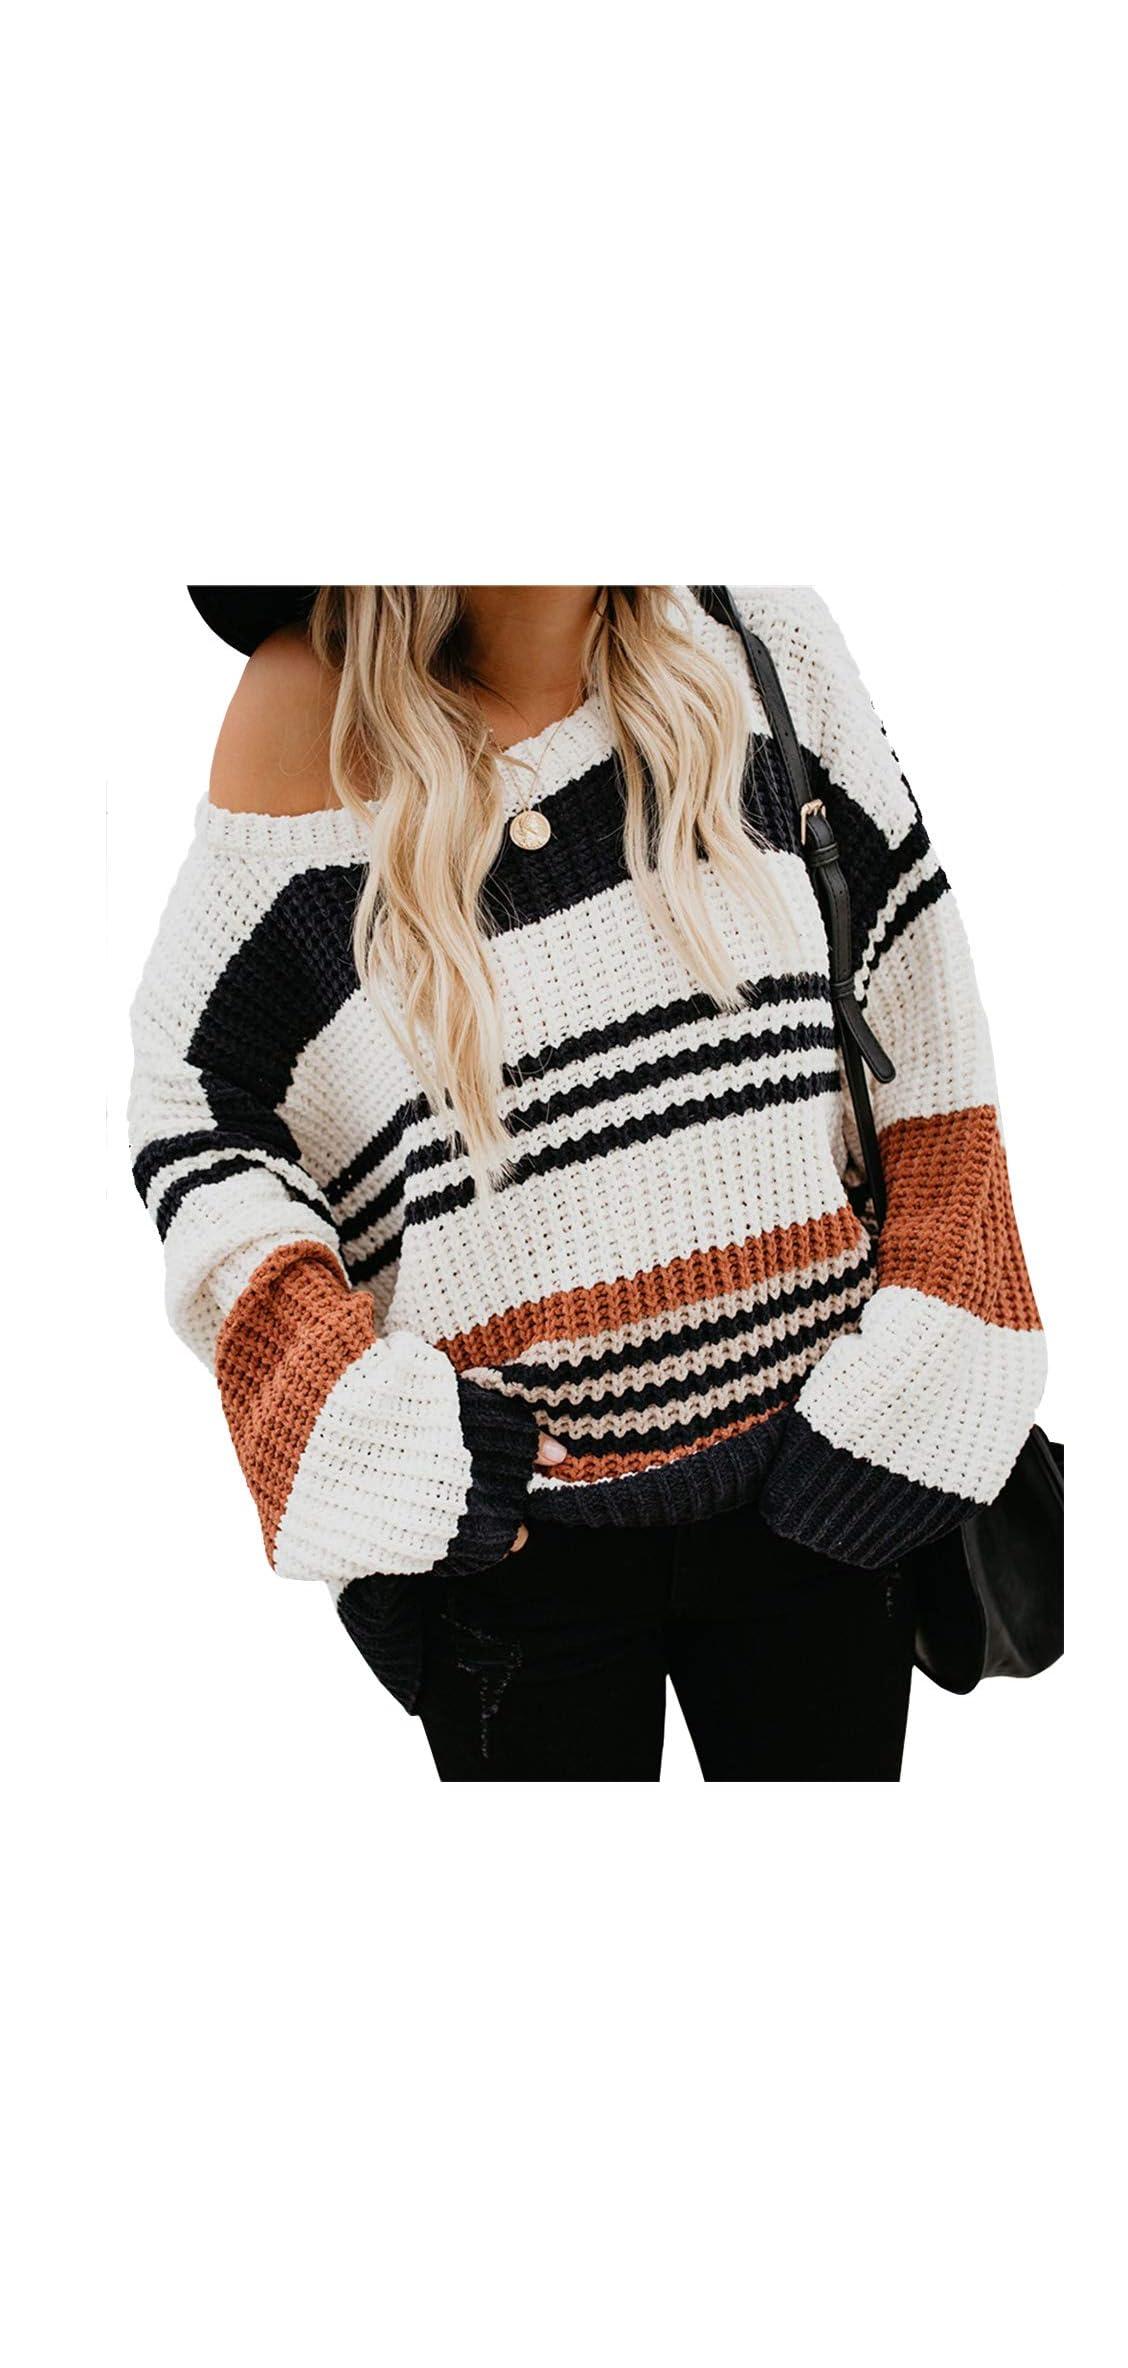 Womens Strip Color Block Short Sweater Long Sleeves